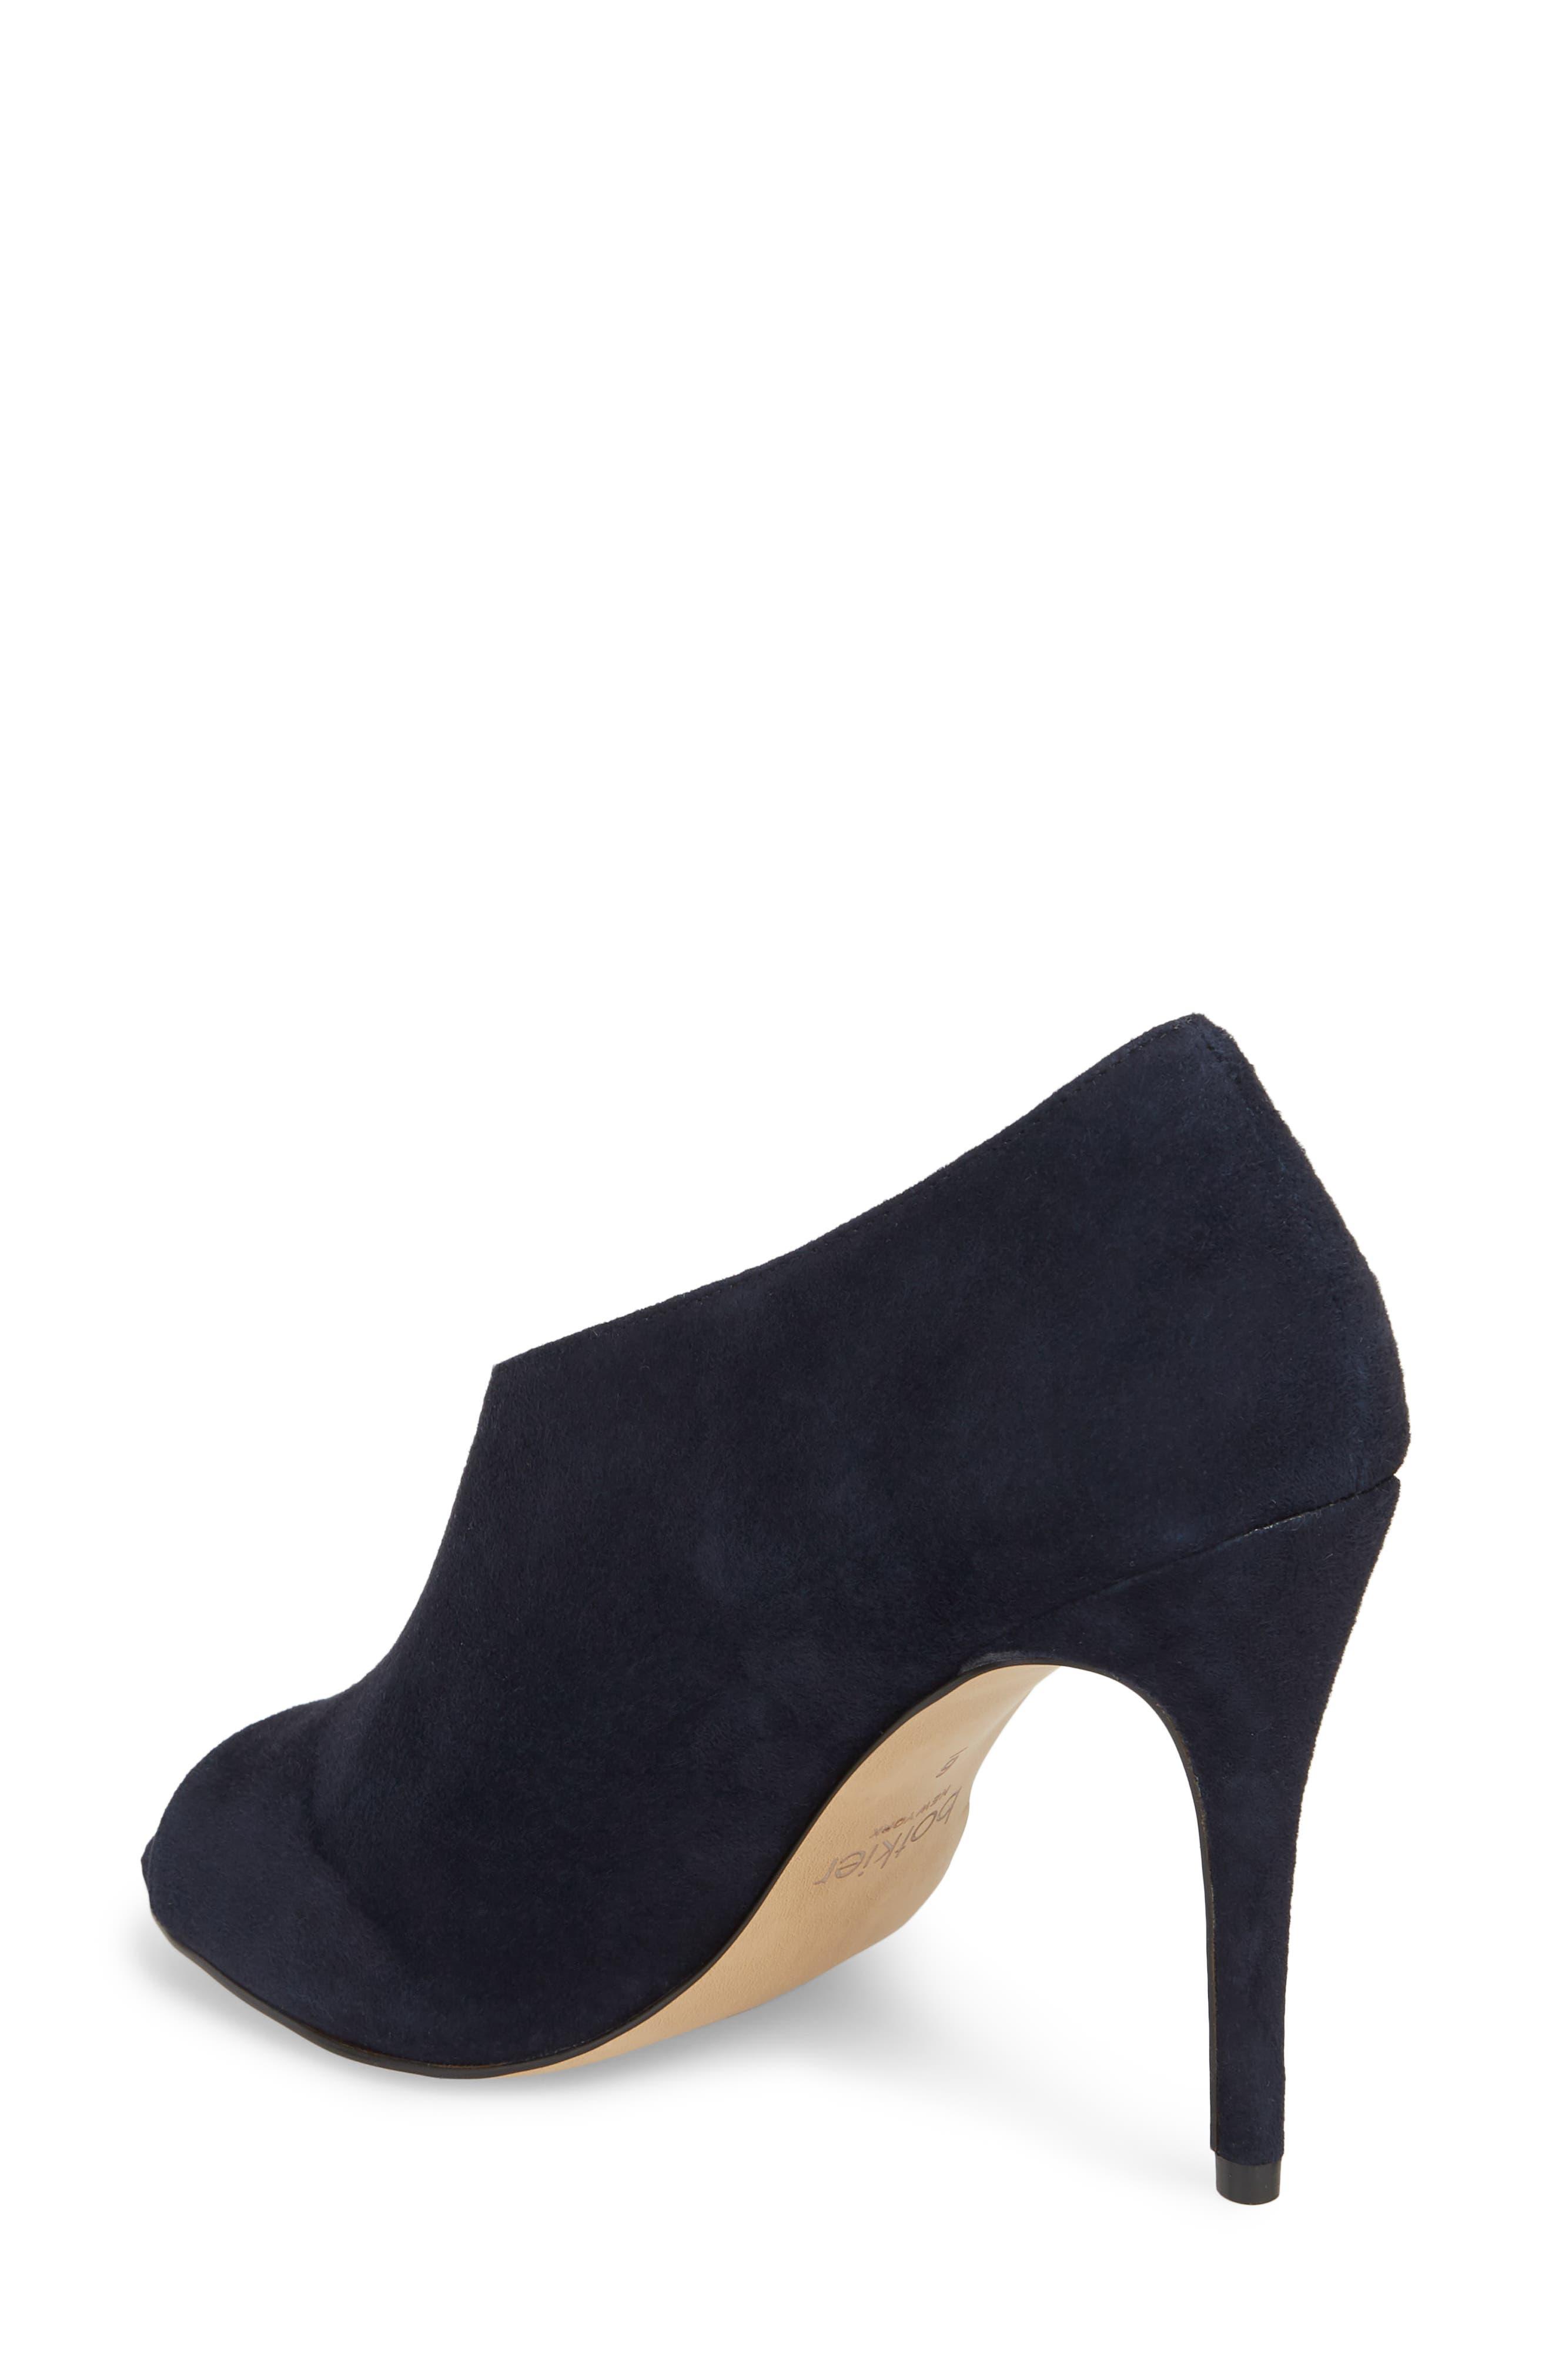 Adelia Asymmetrical Sandal,                             Alternate thumbnail 2, color,                             Navy Suede